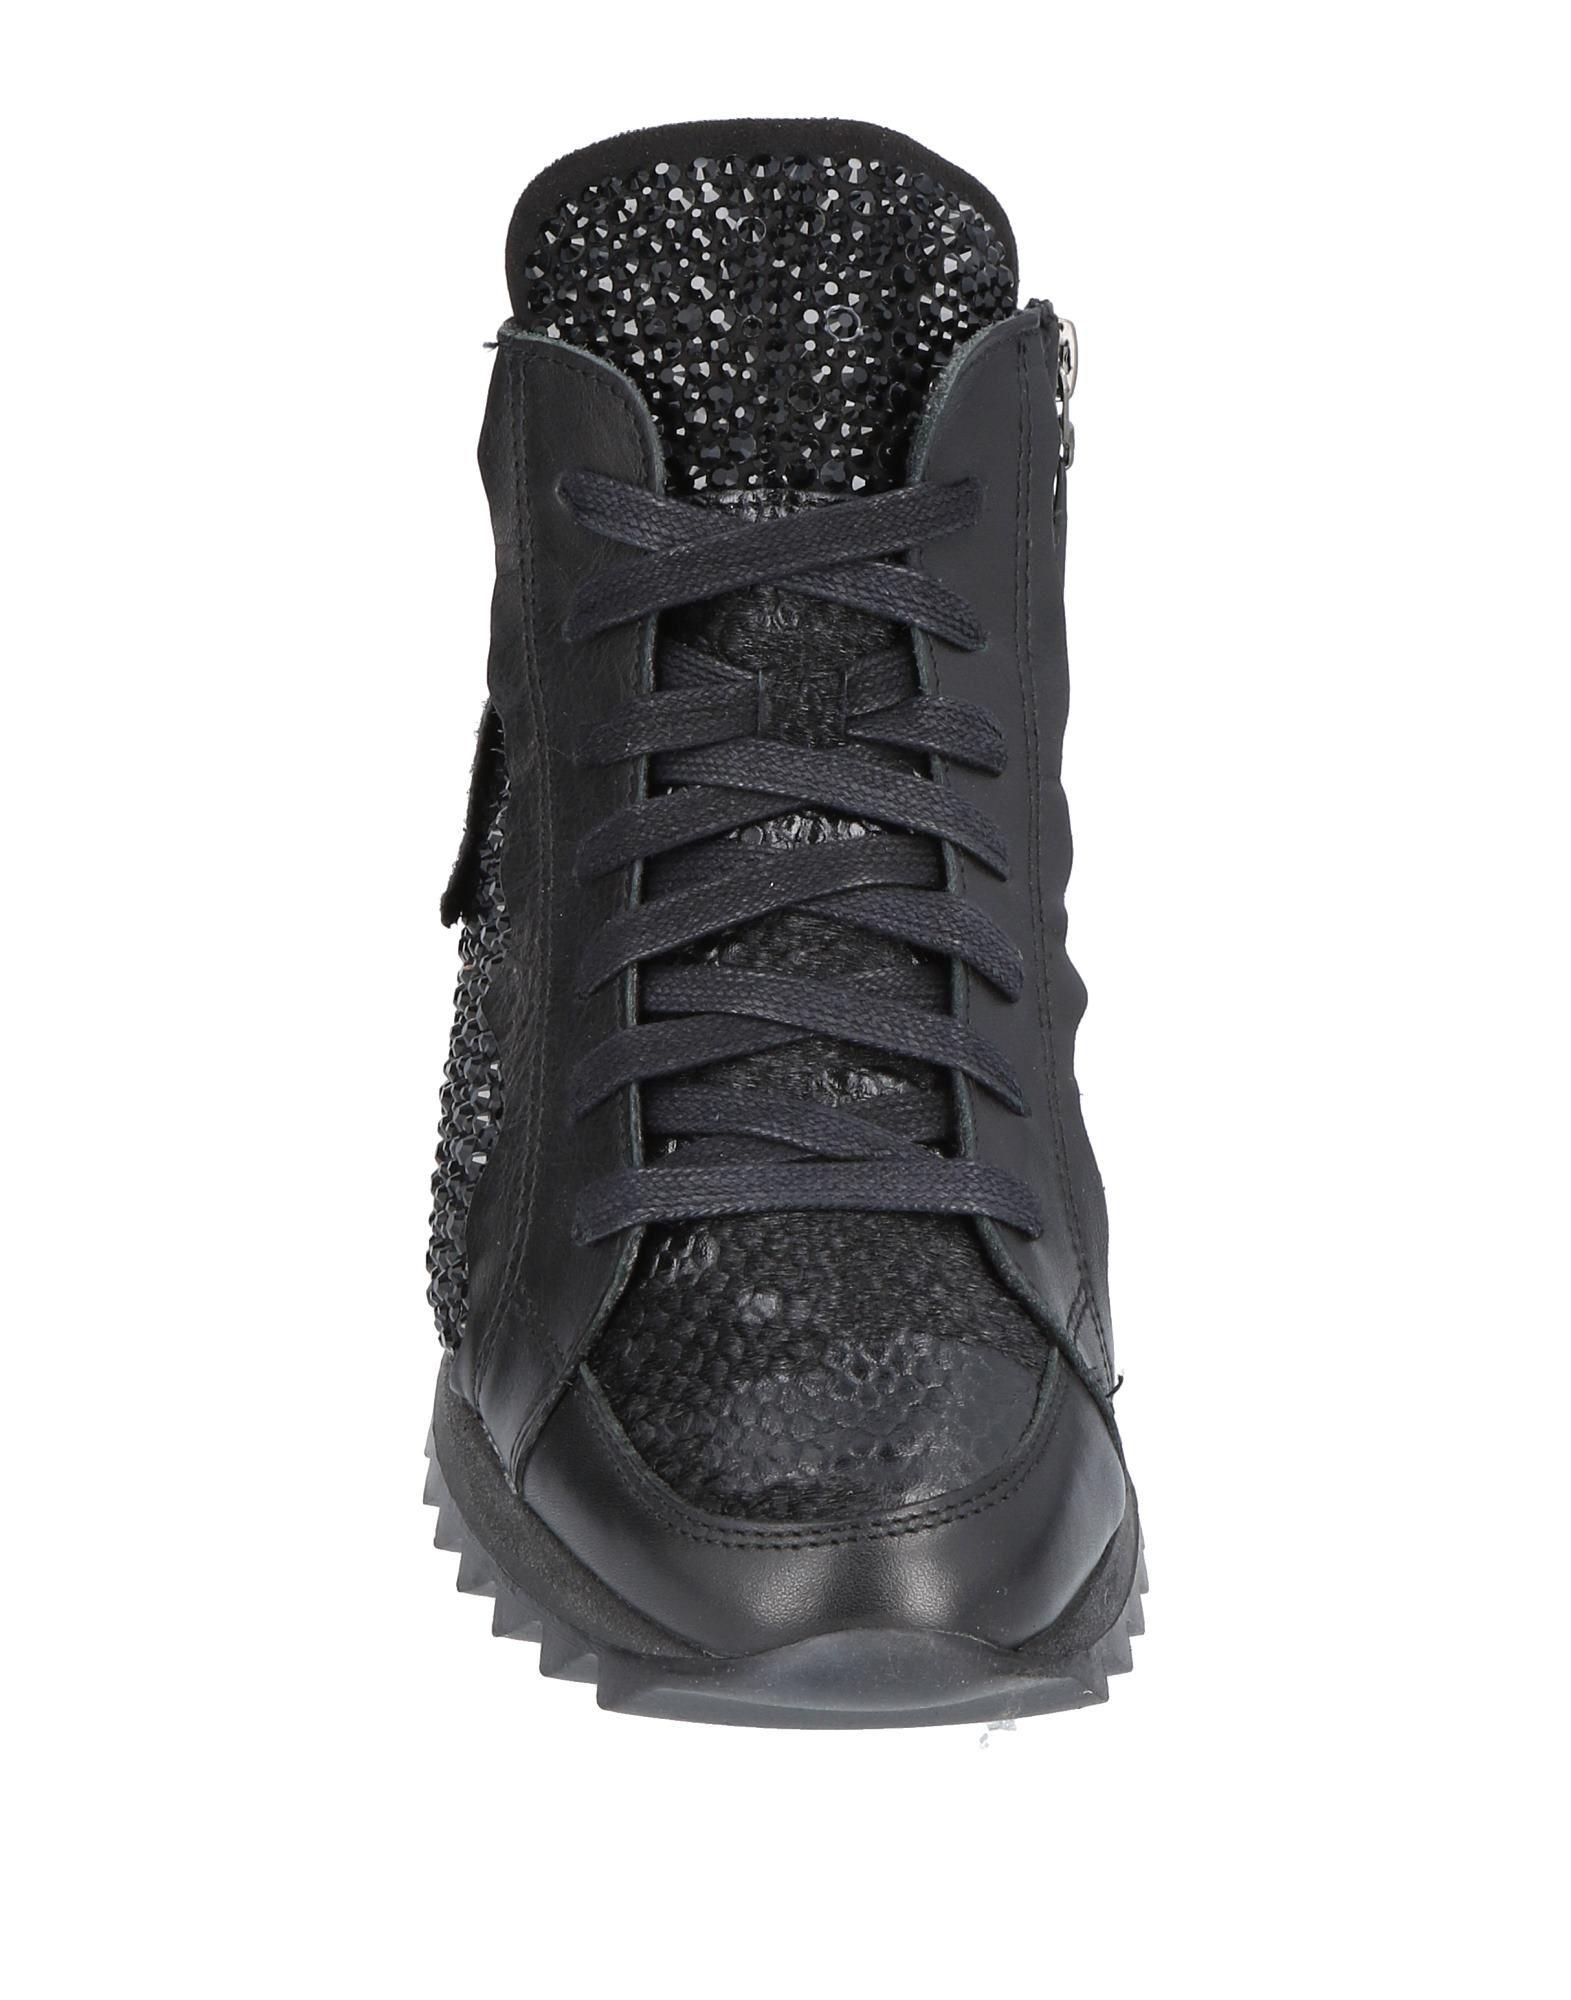 Alberto Venturini Turnschuhes Damen Schuhe 11468334CS Gute Qualität beliebte Schuhe Damen 7dd1a0